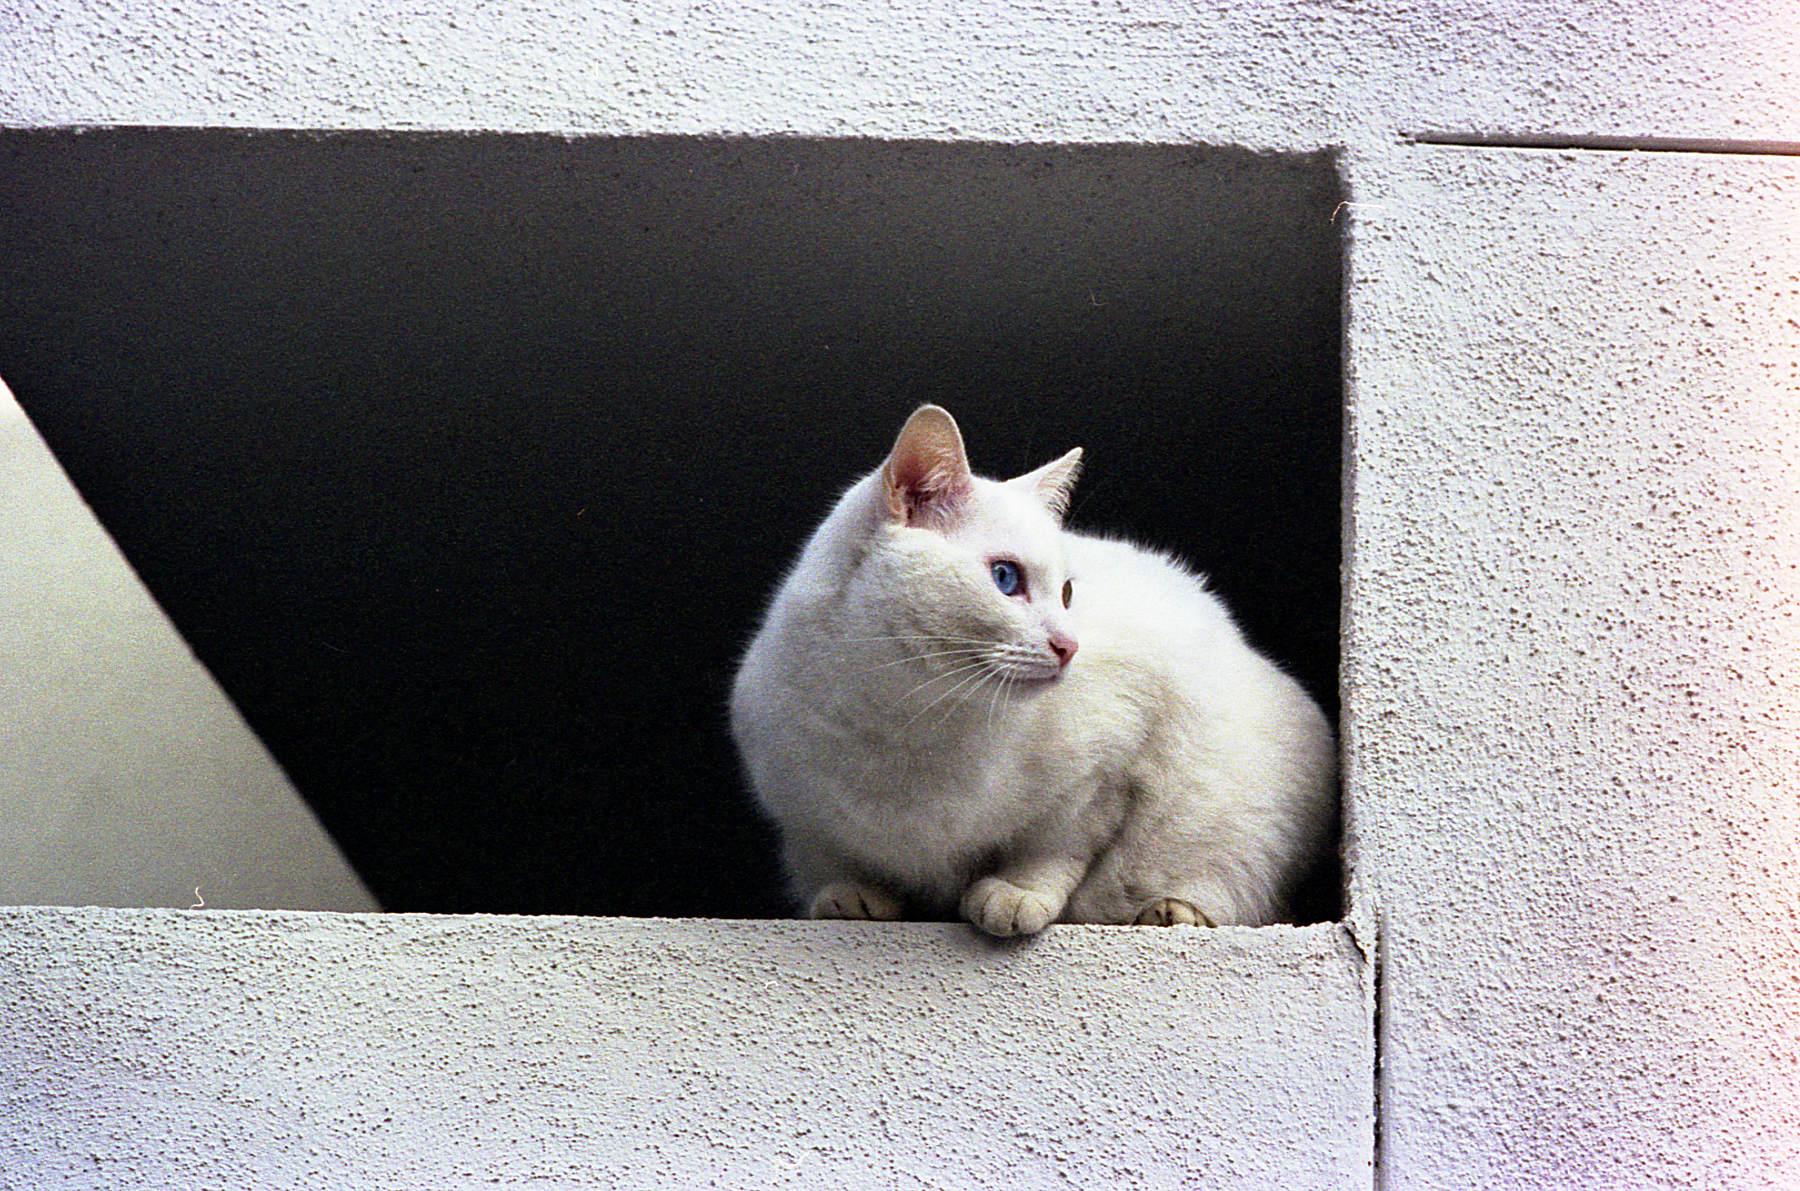 Hollywood cat